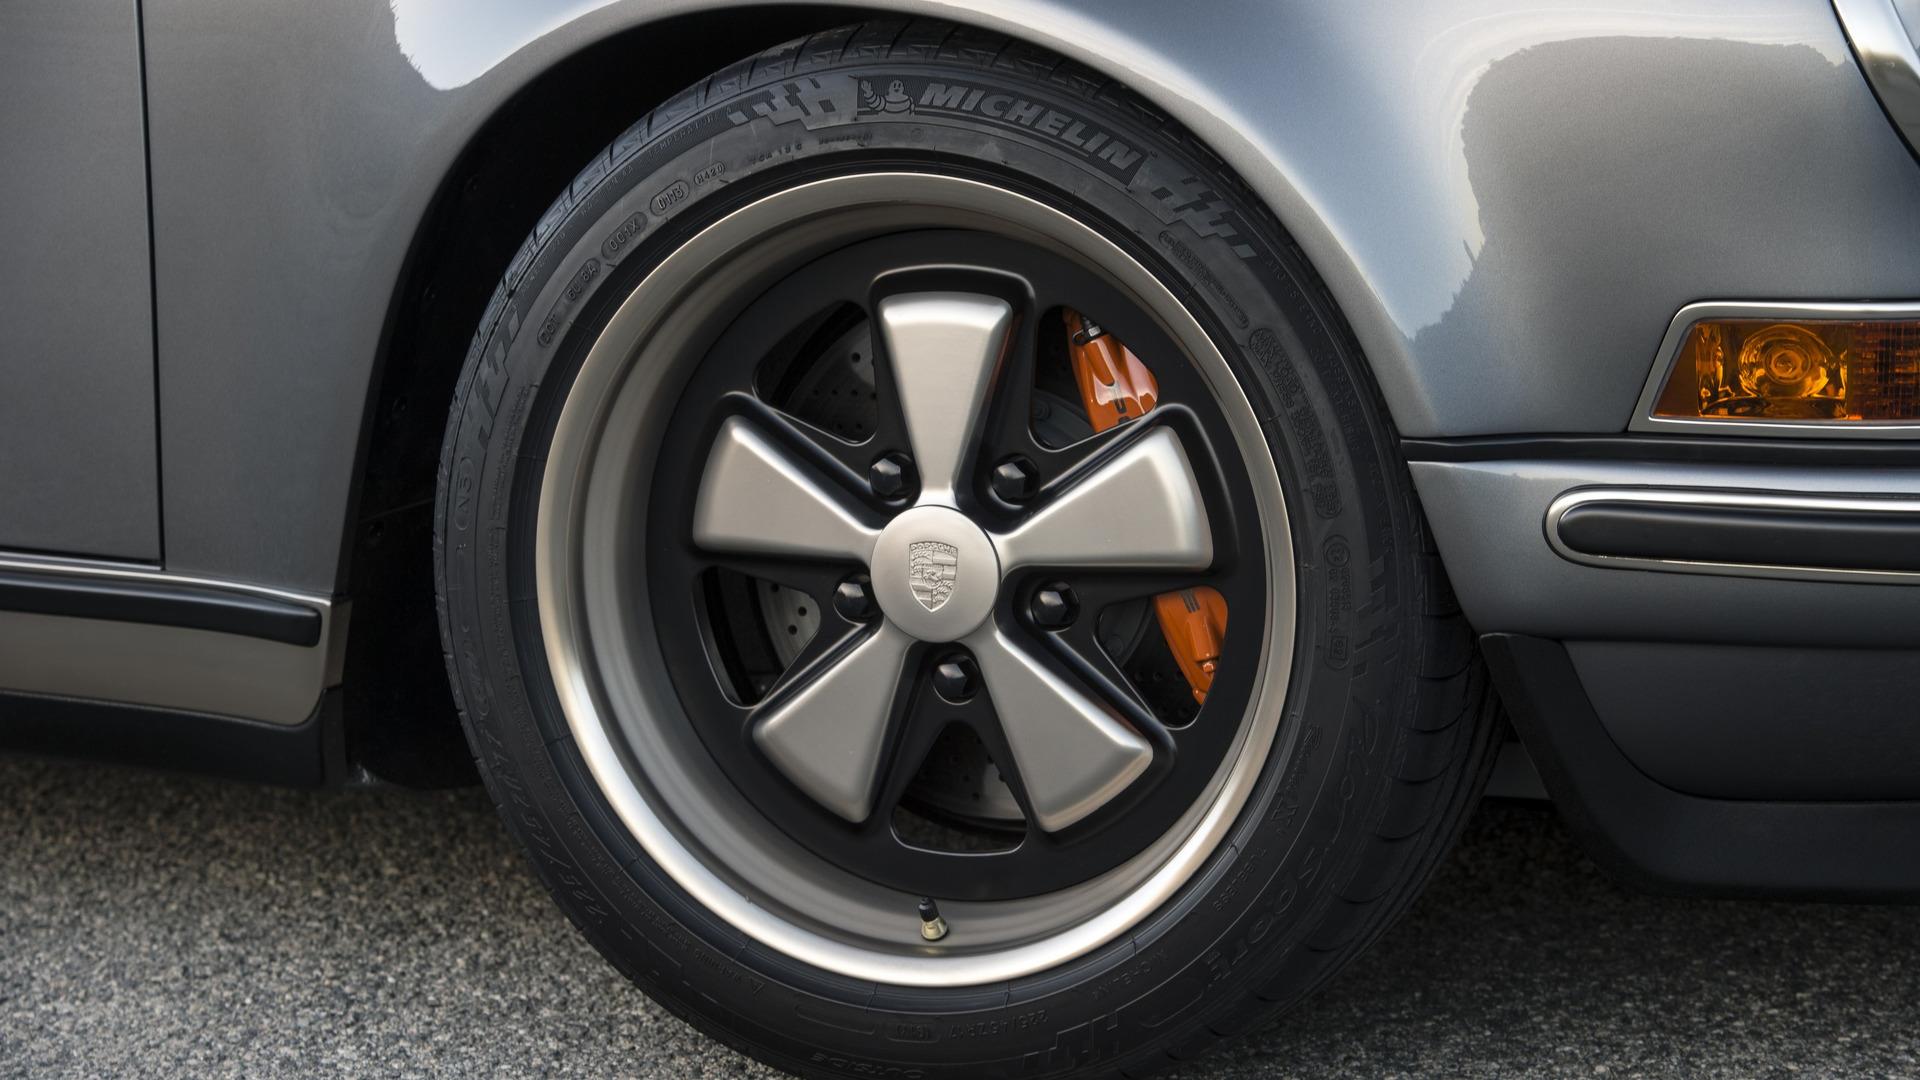 Porsche recalling 30k bottles of brake fluid due to typo